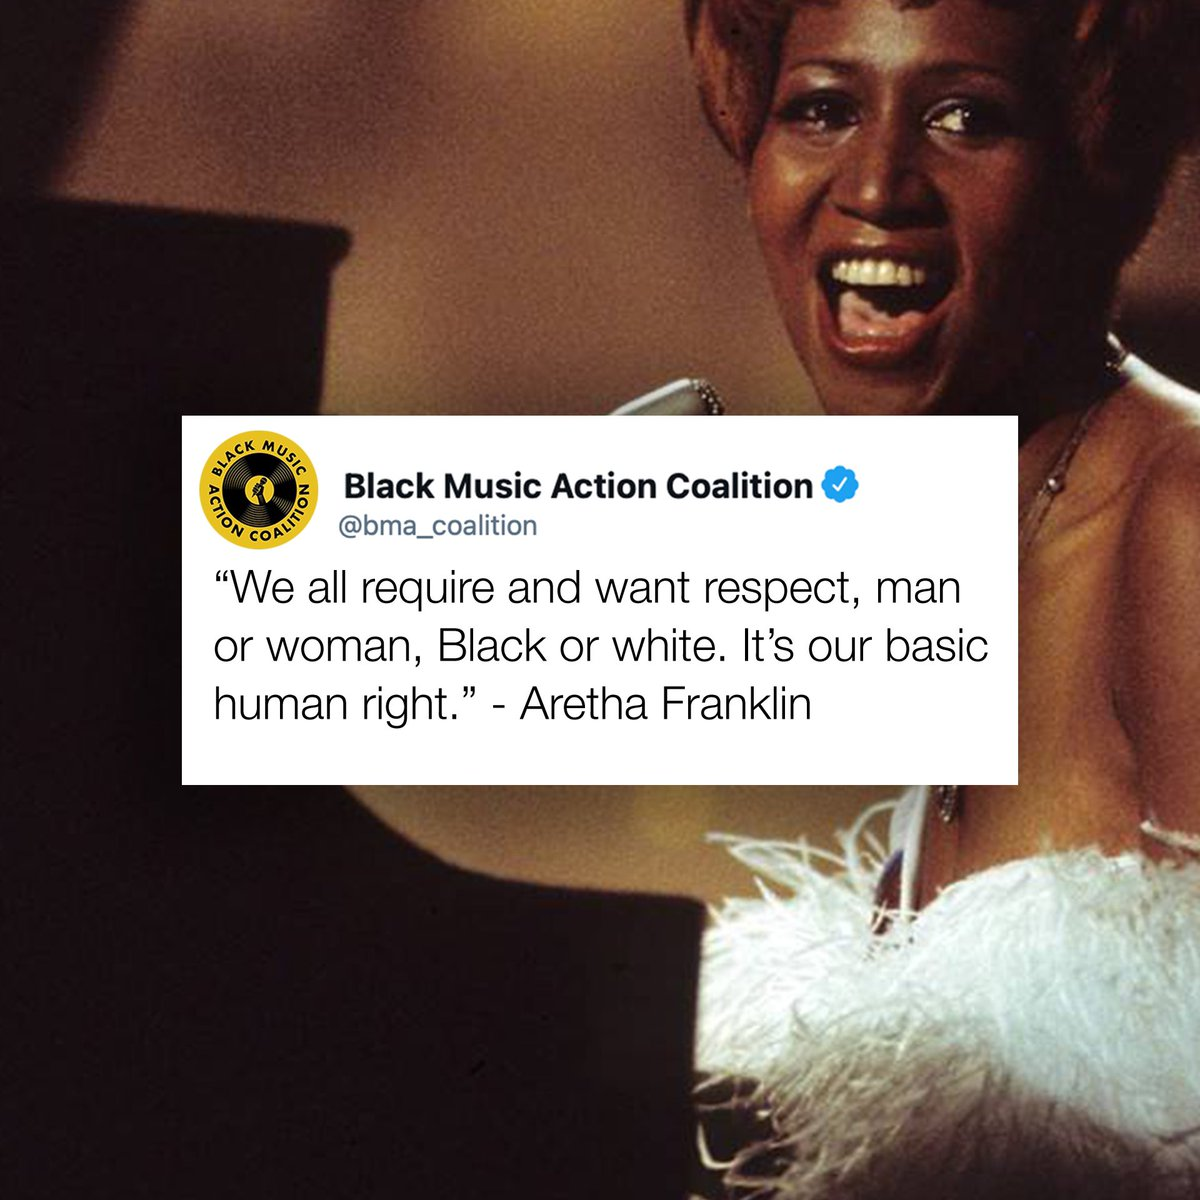 R.E.S.P.E.C.T 🔊🔊🔊🔊 #BlackArtistMatter #BlackMusicMatters #BlackLivesMatter #BMAC #AREATHA